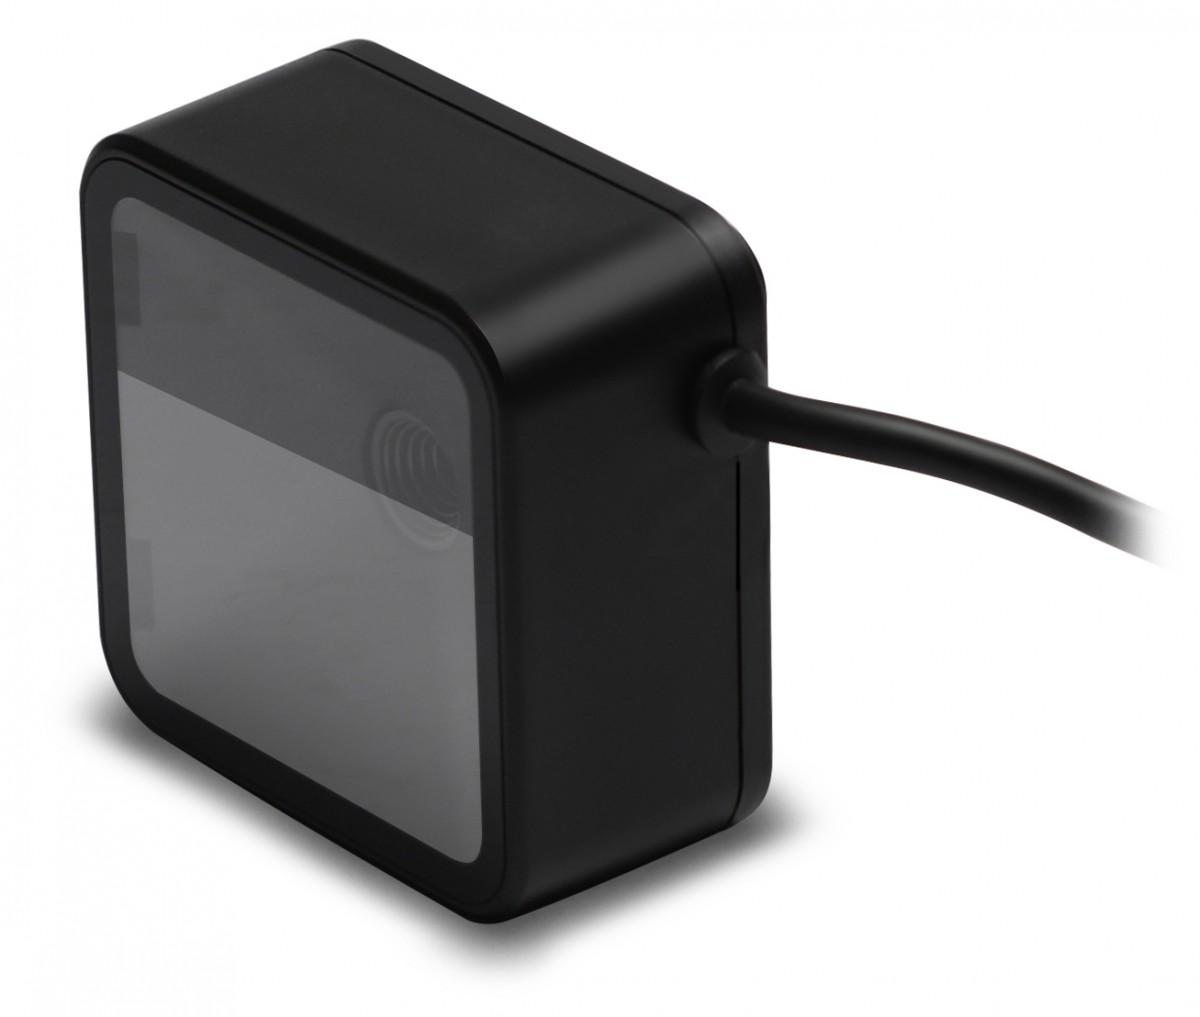 Сканер штрих-кода Mercury N120 2D